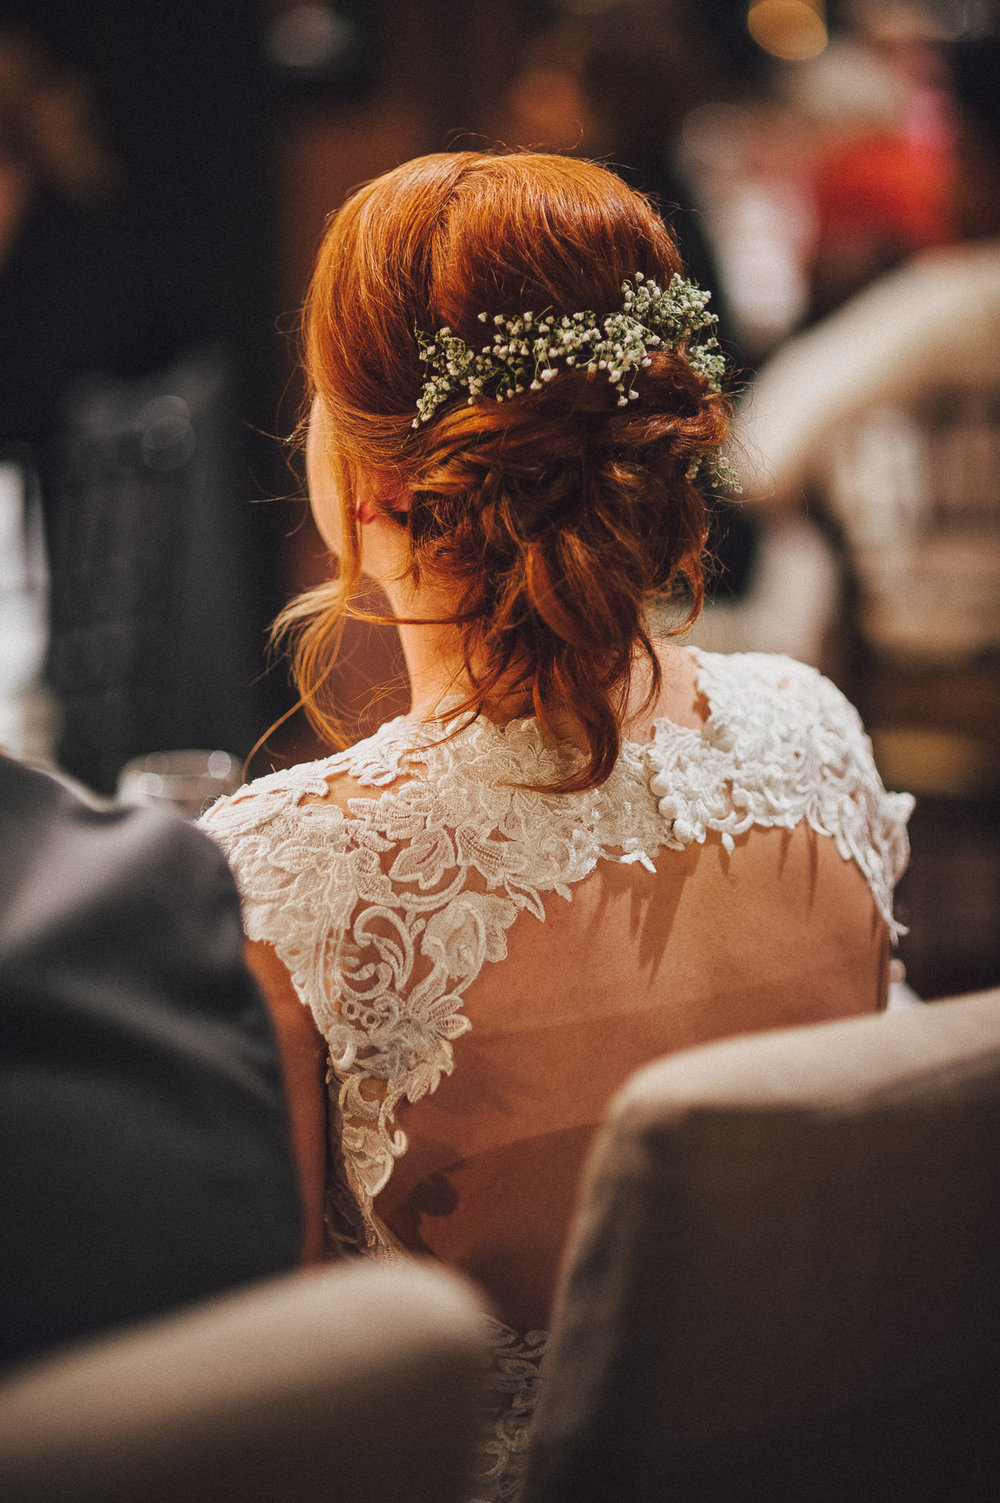 breighton-and-basette-photography-copyrighted-image-blog-amanda-and-eric-wedding-114.jpg